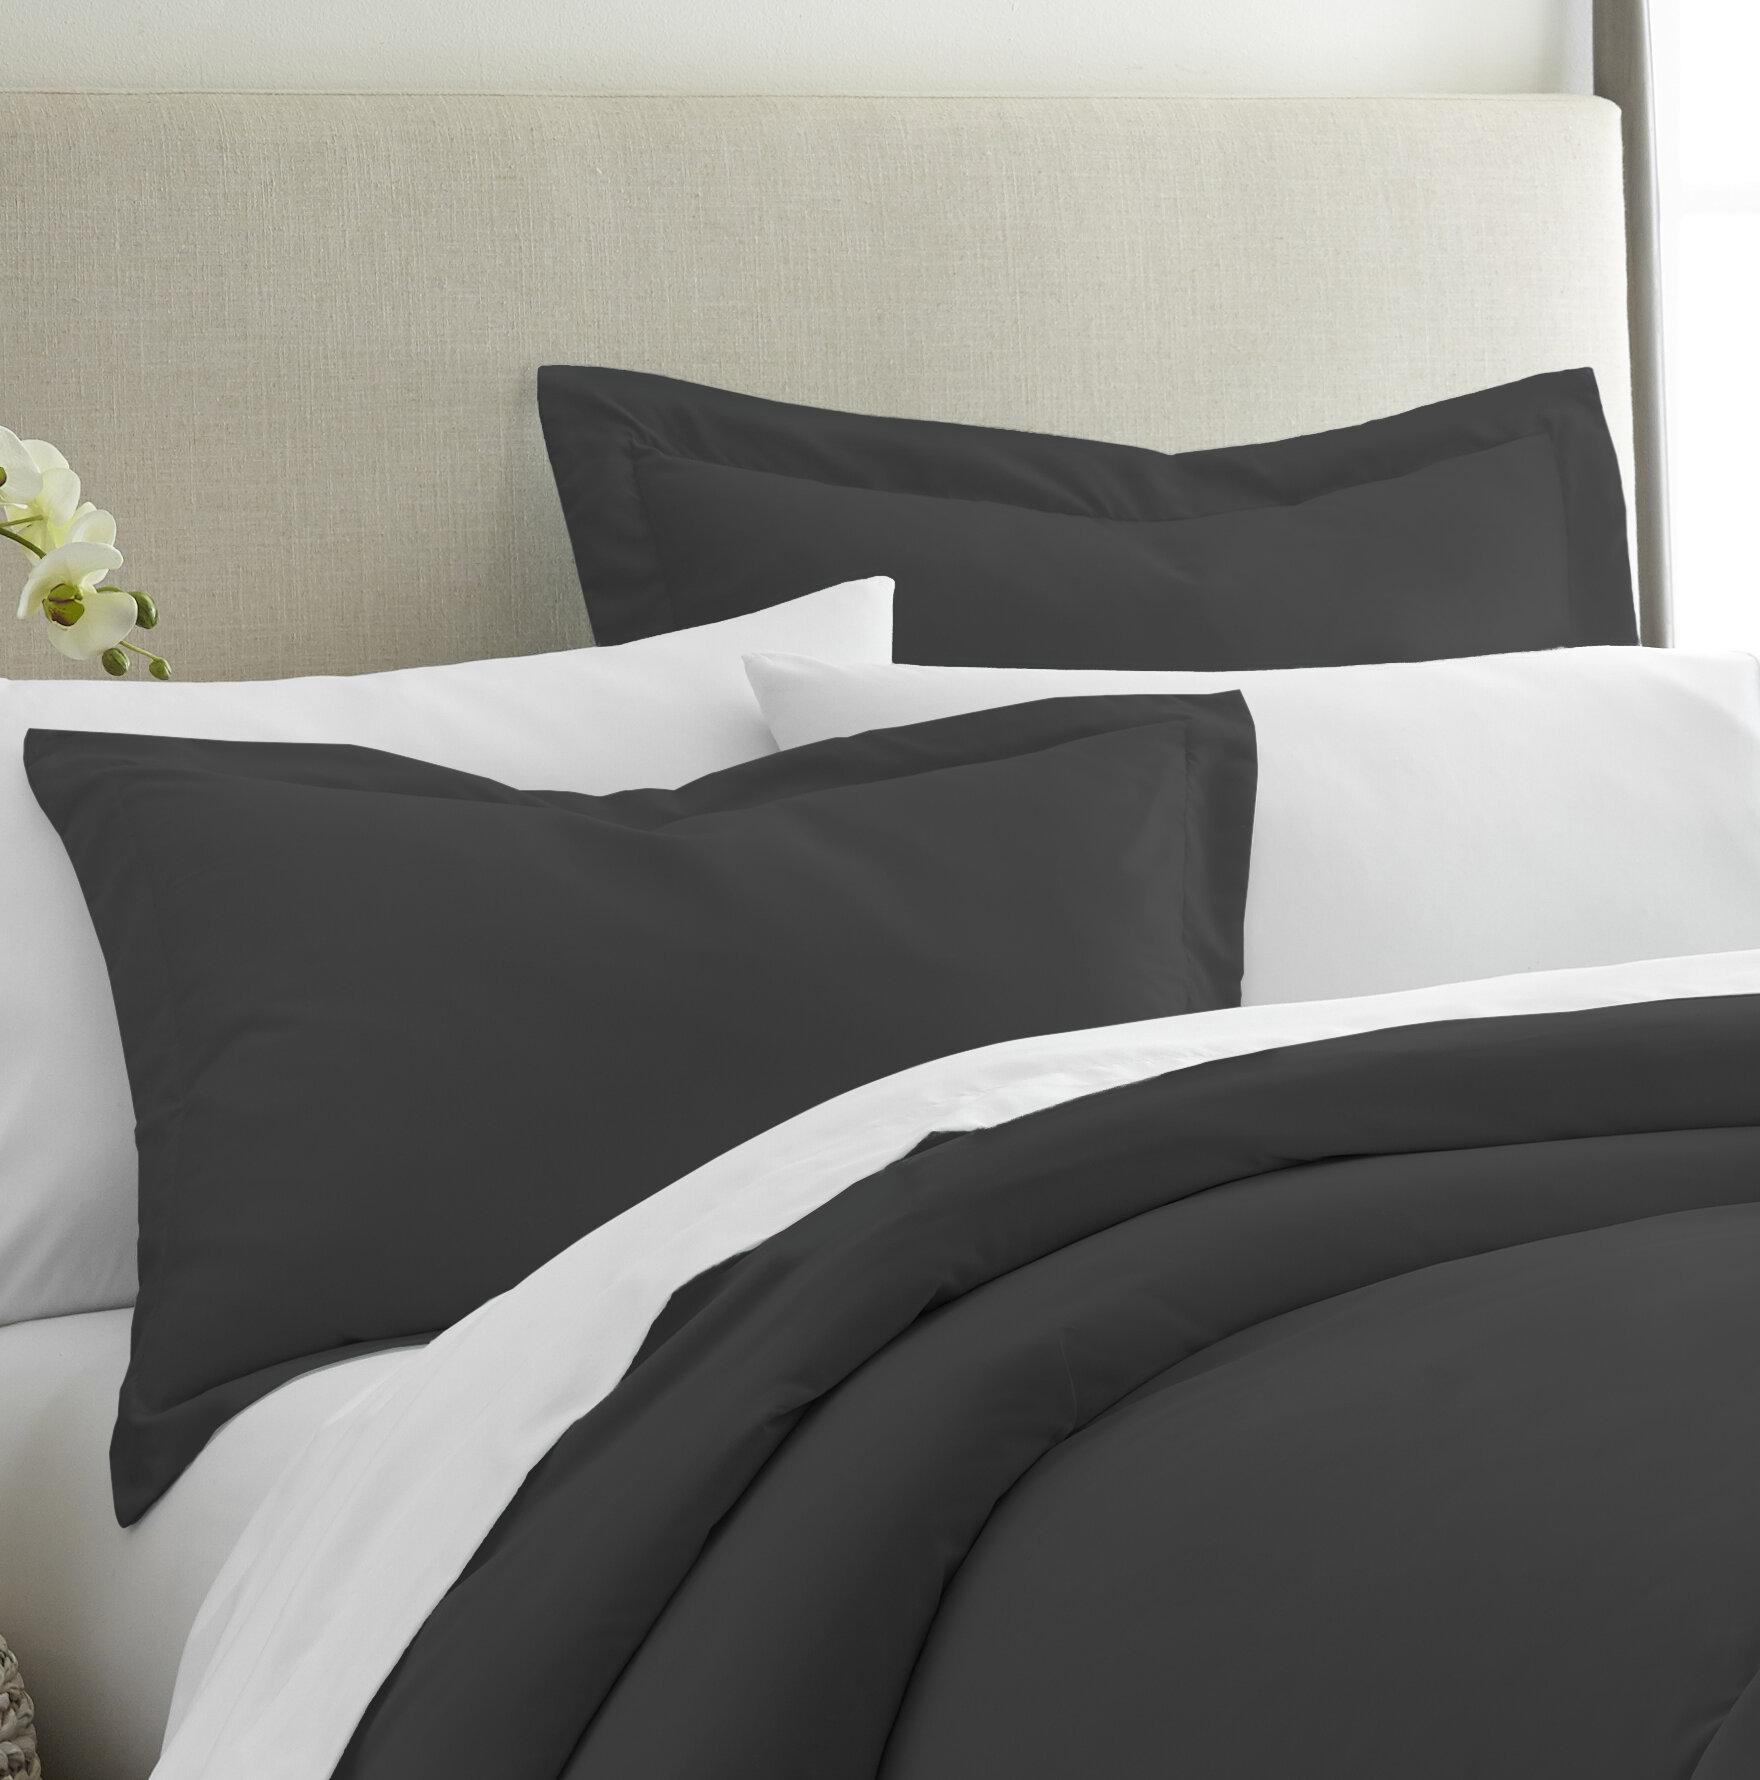 Black Pillow Shams Euro Shams Free Shipping Over 35 Wayfair